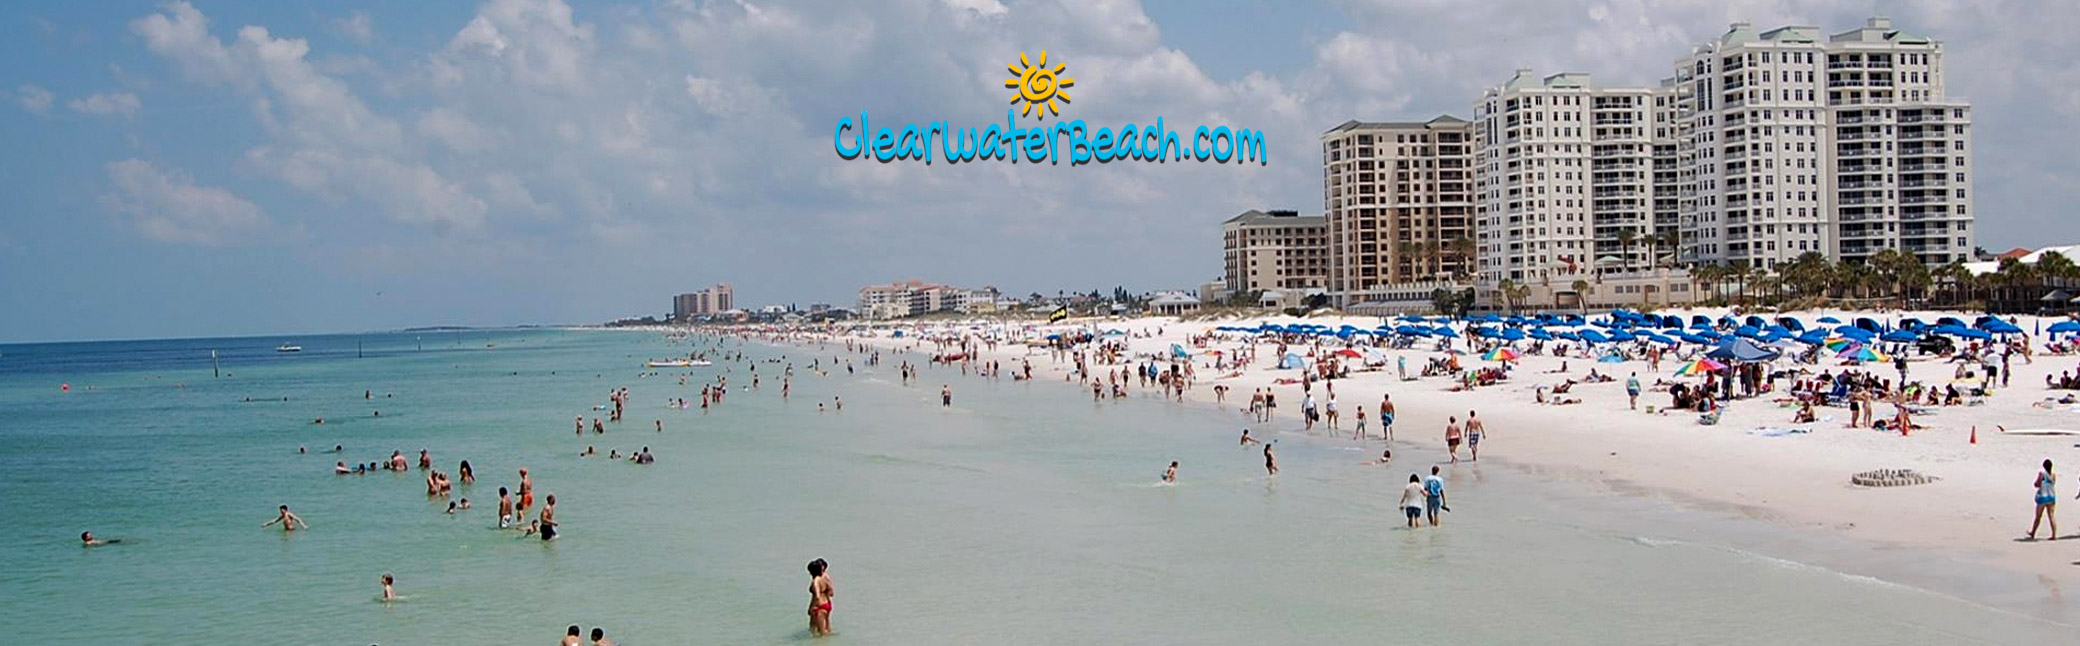 Hotel Rentals On Clearwater Beach